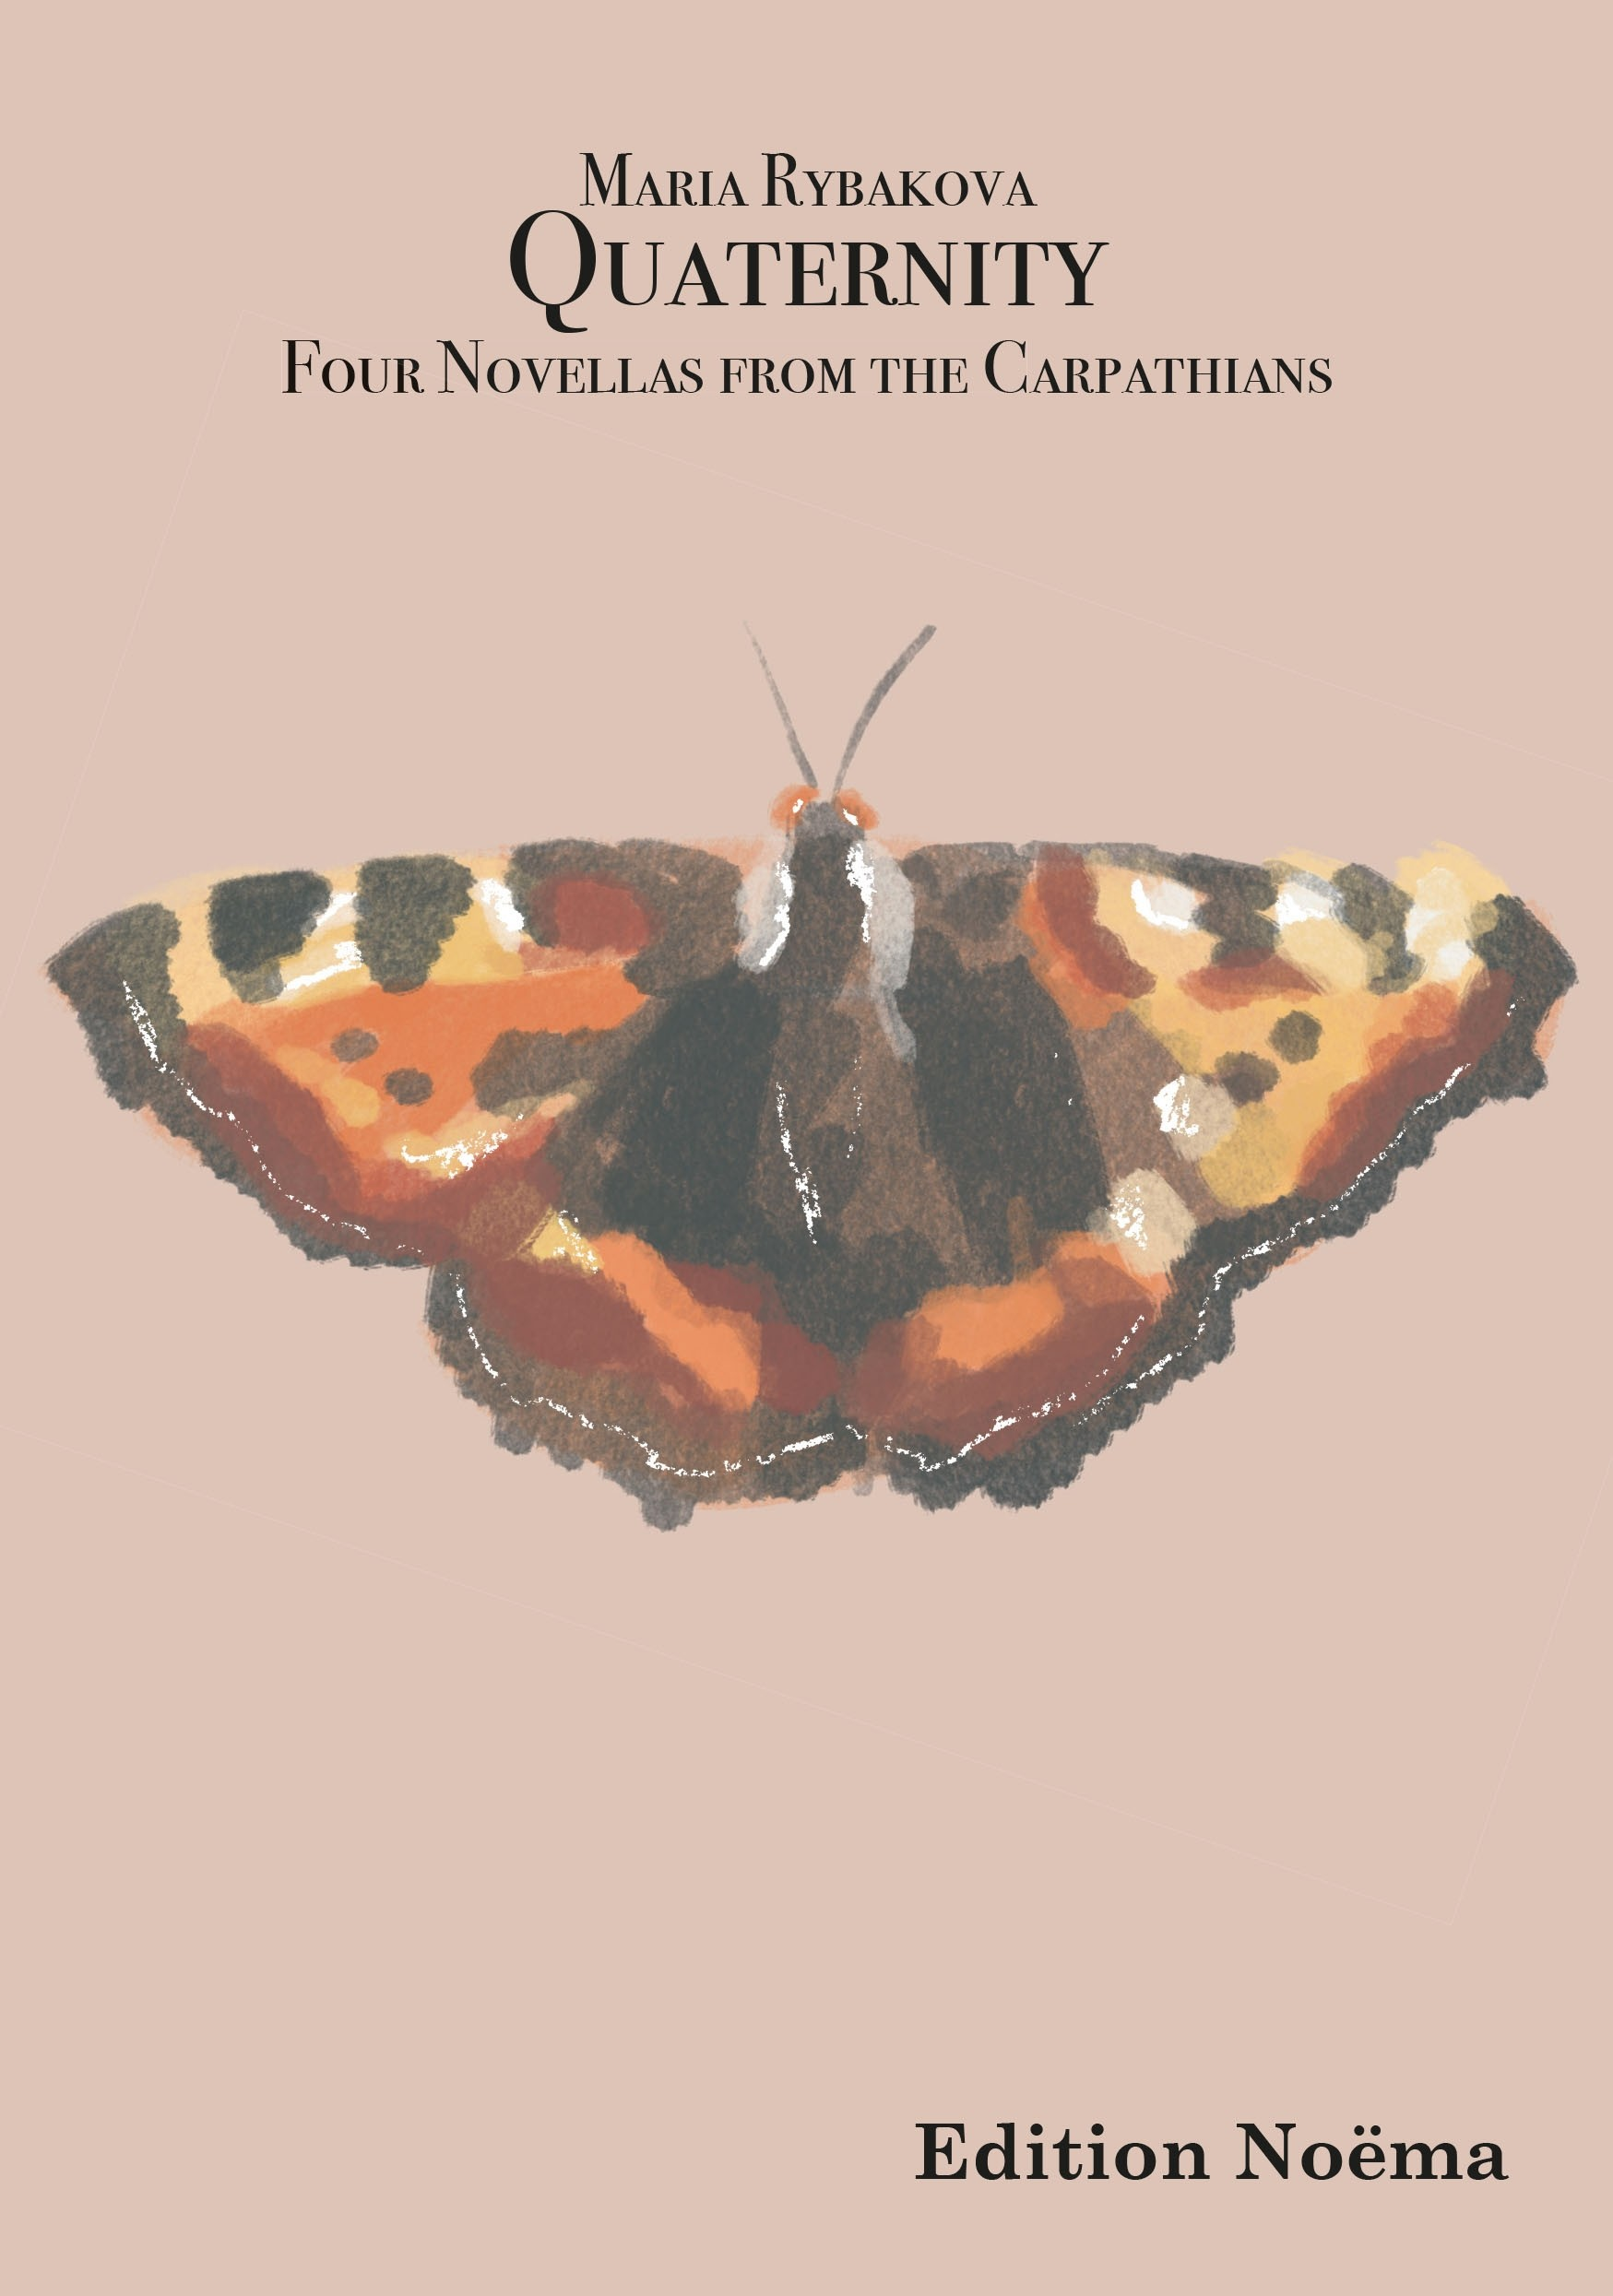 Quaternity. Four Novellas from the Carpathians